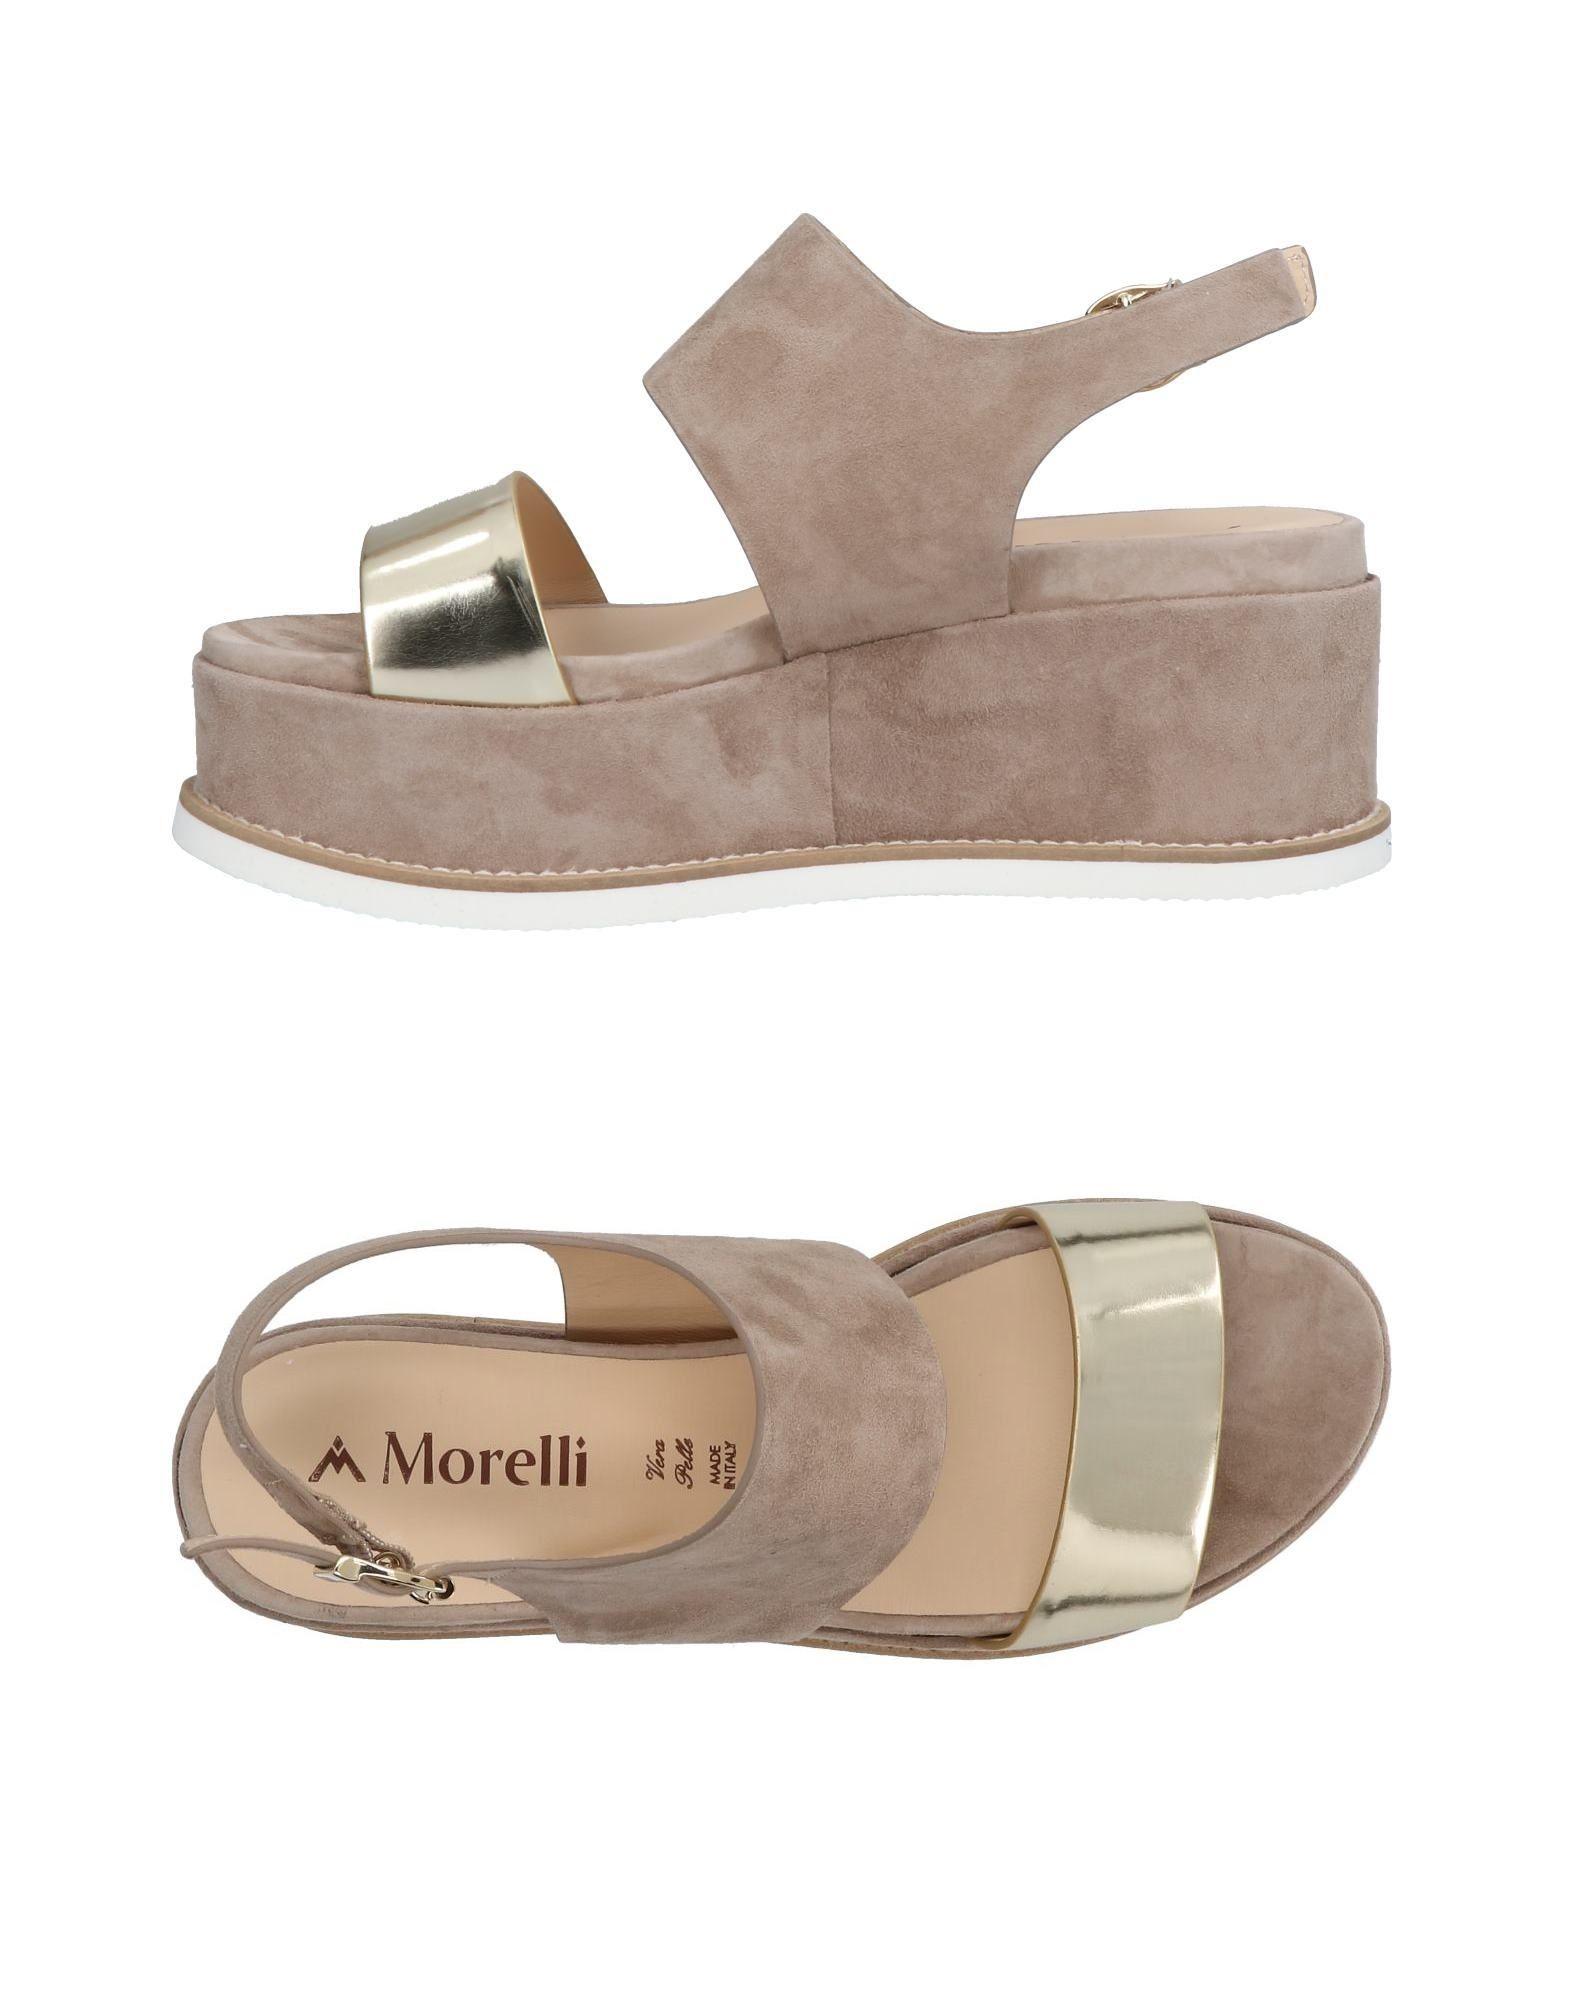 Sandales Andrea Morelli Femme - Sandales Andrea Morelli sur